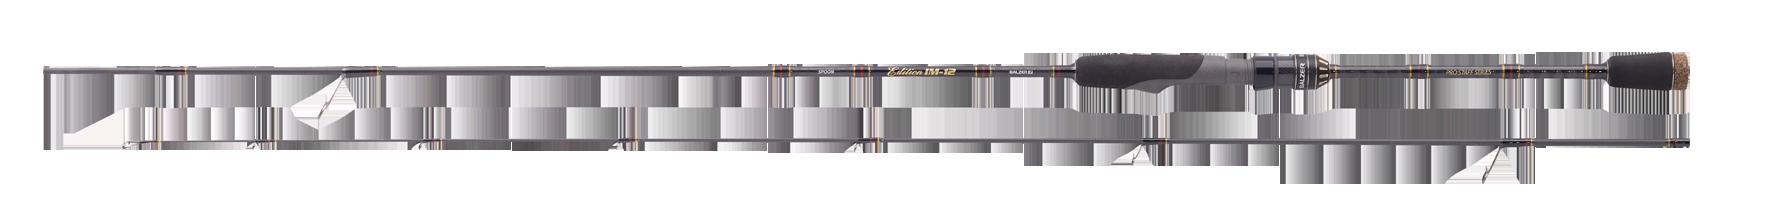 Edition IM-12 PRO STAFF Serie